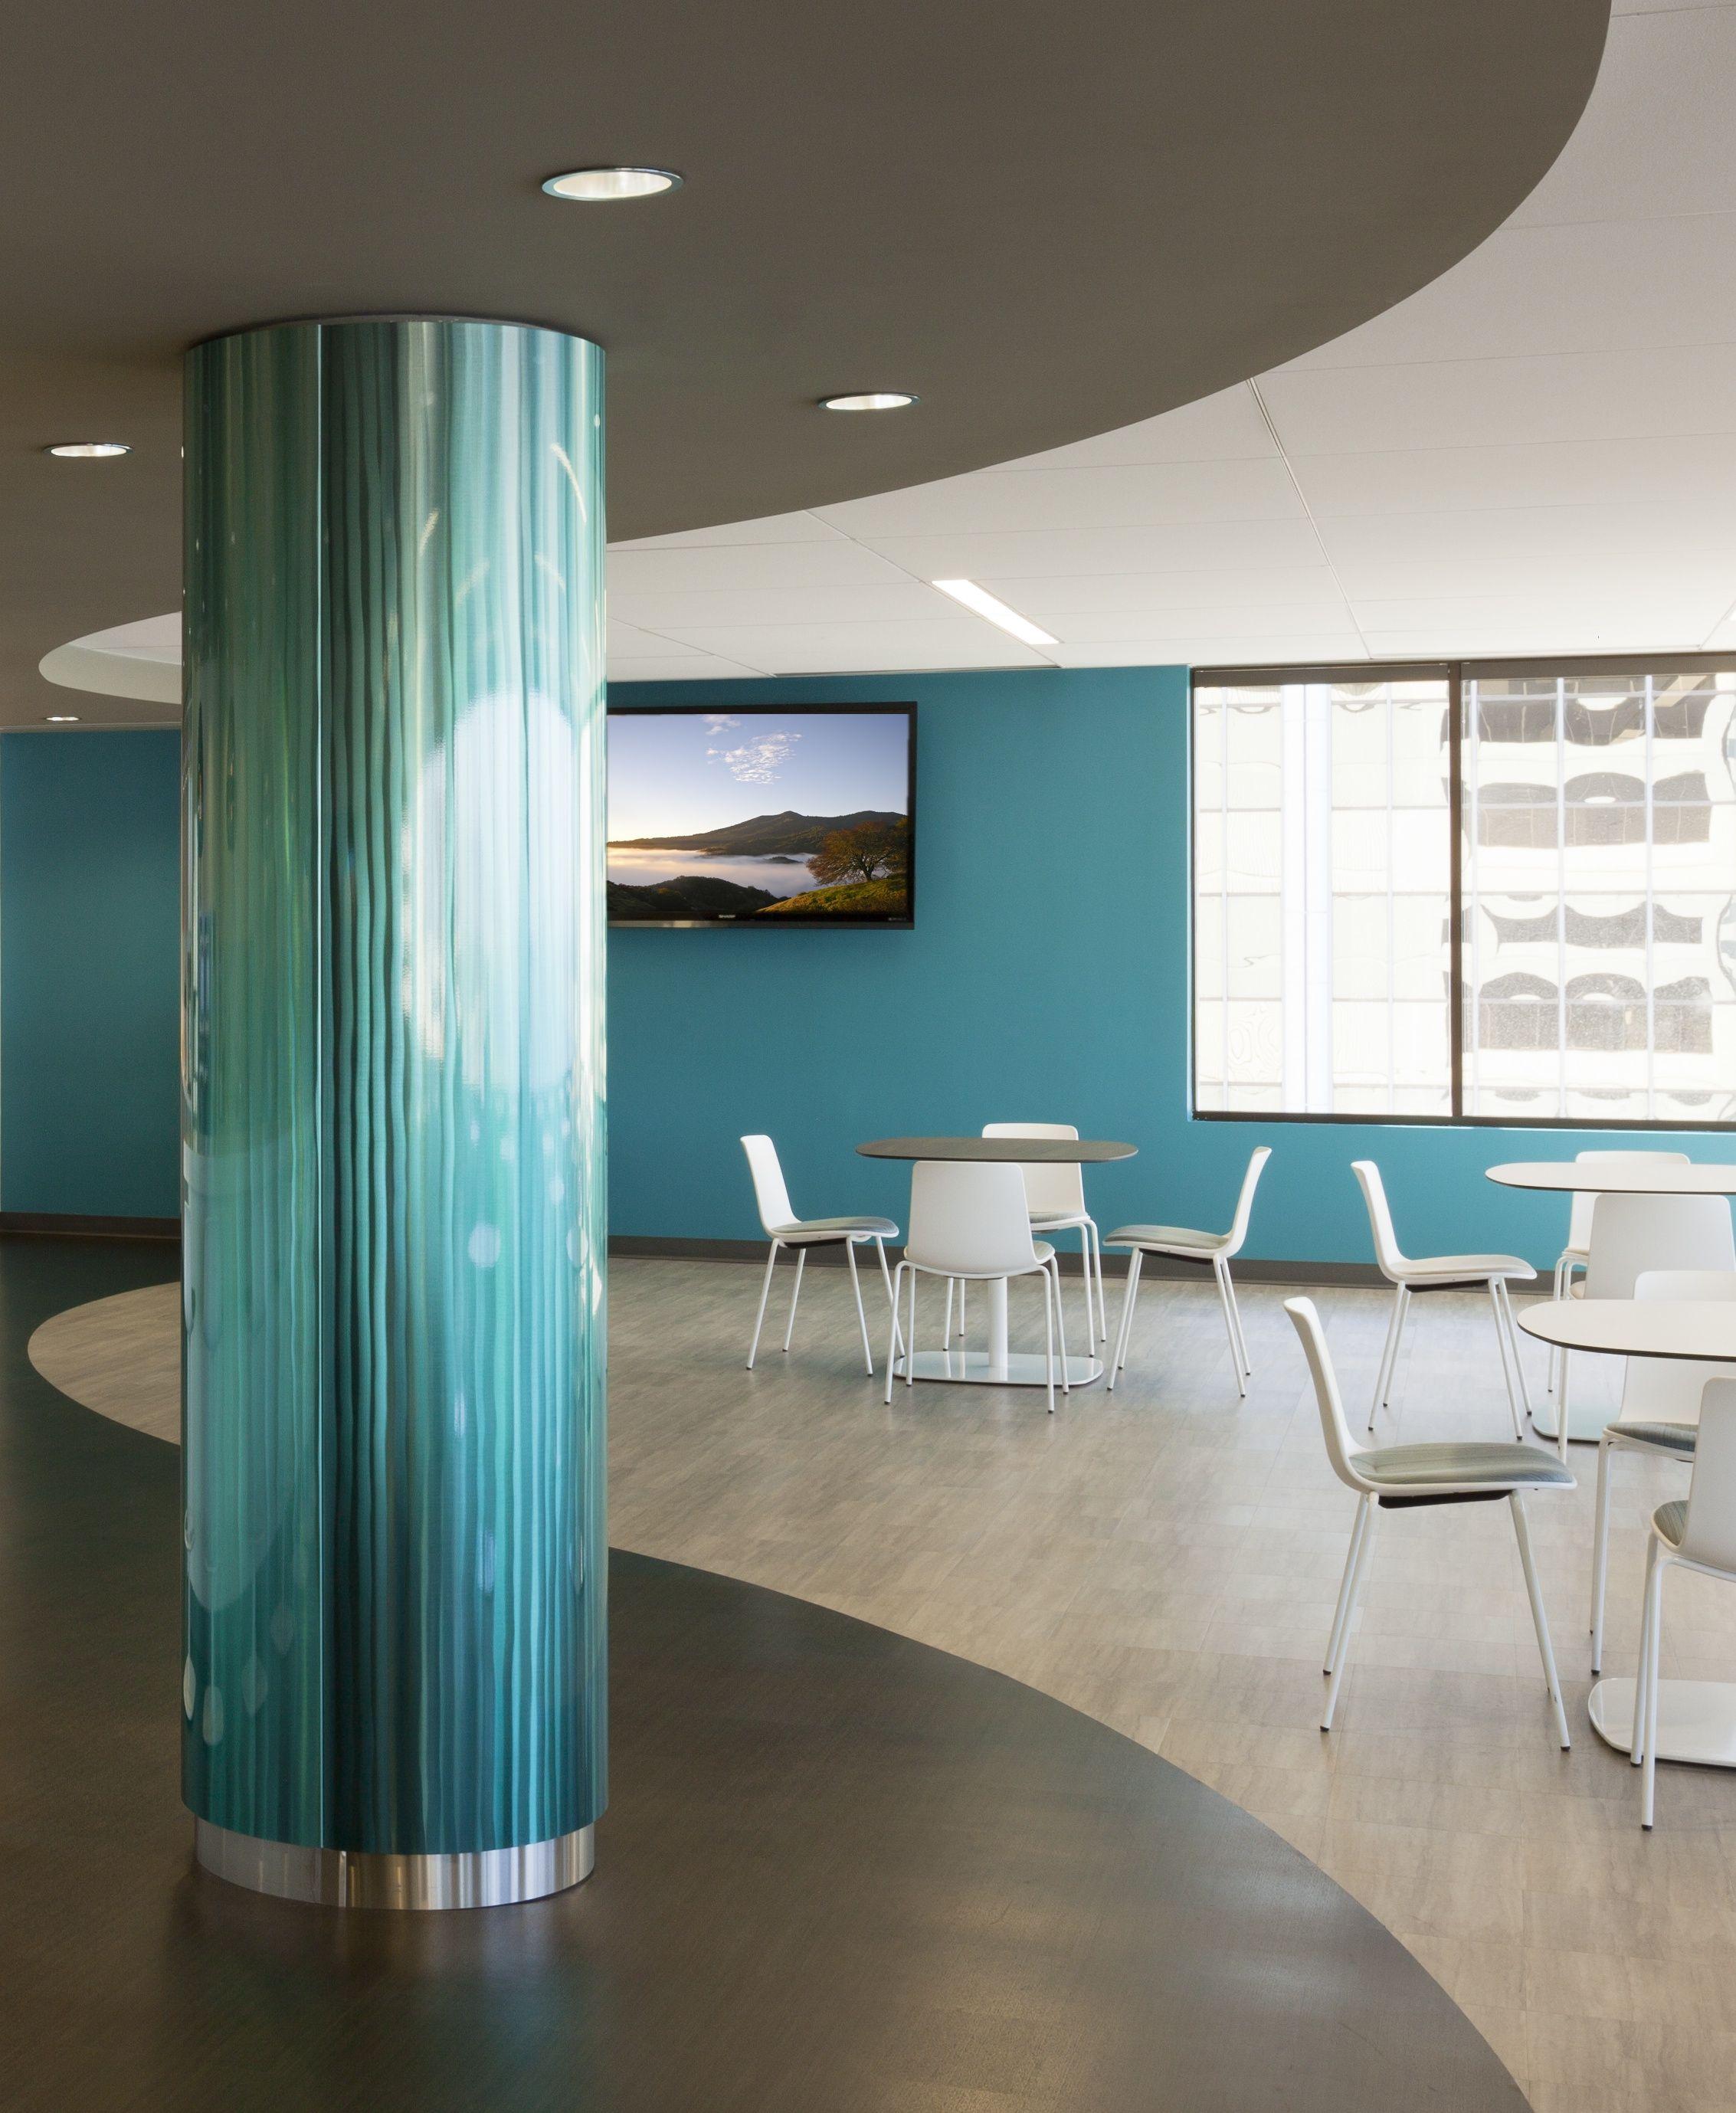 Moz Easy To Assemble Eta Round Column Covers With Custom Blendz Http Www Mozdesigns Com Systcolumns Html Column Design Interior Design Office Space Design